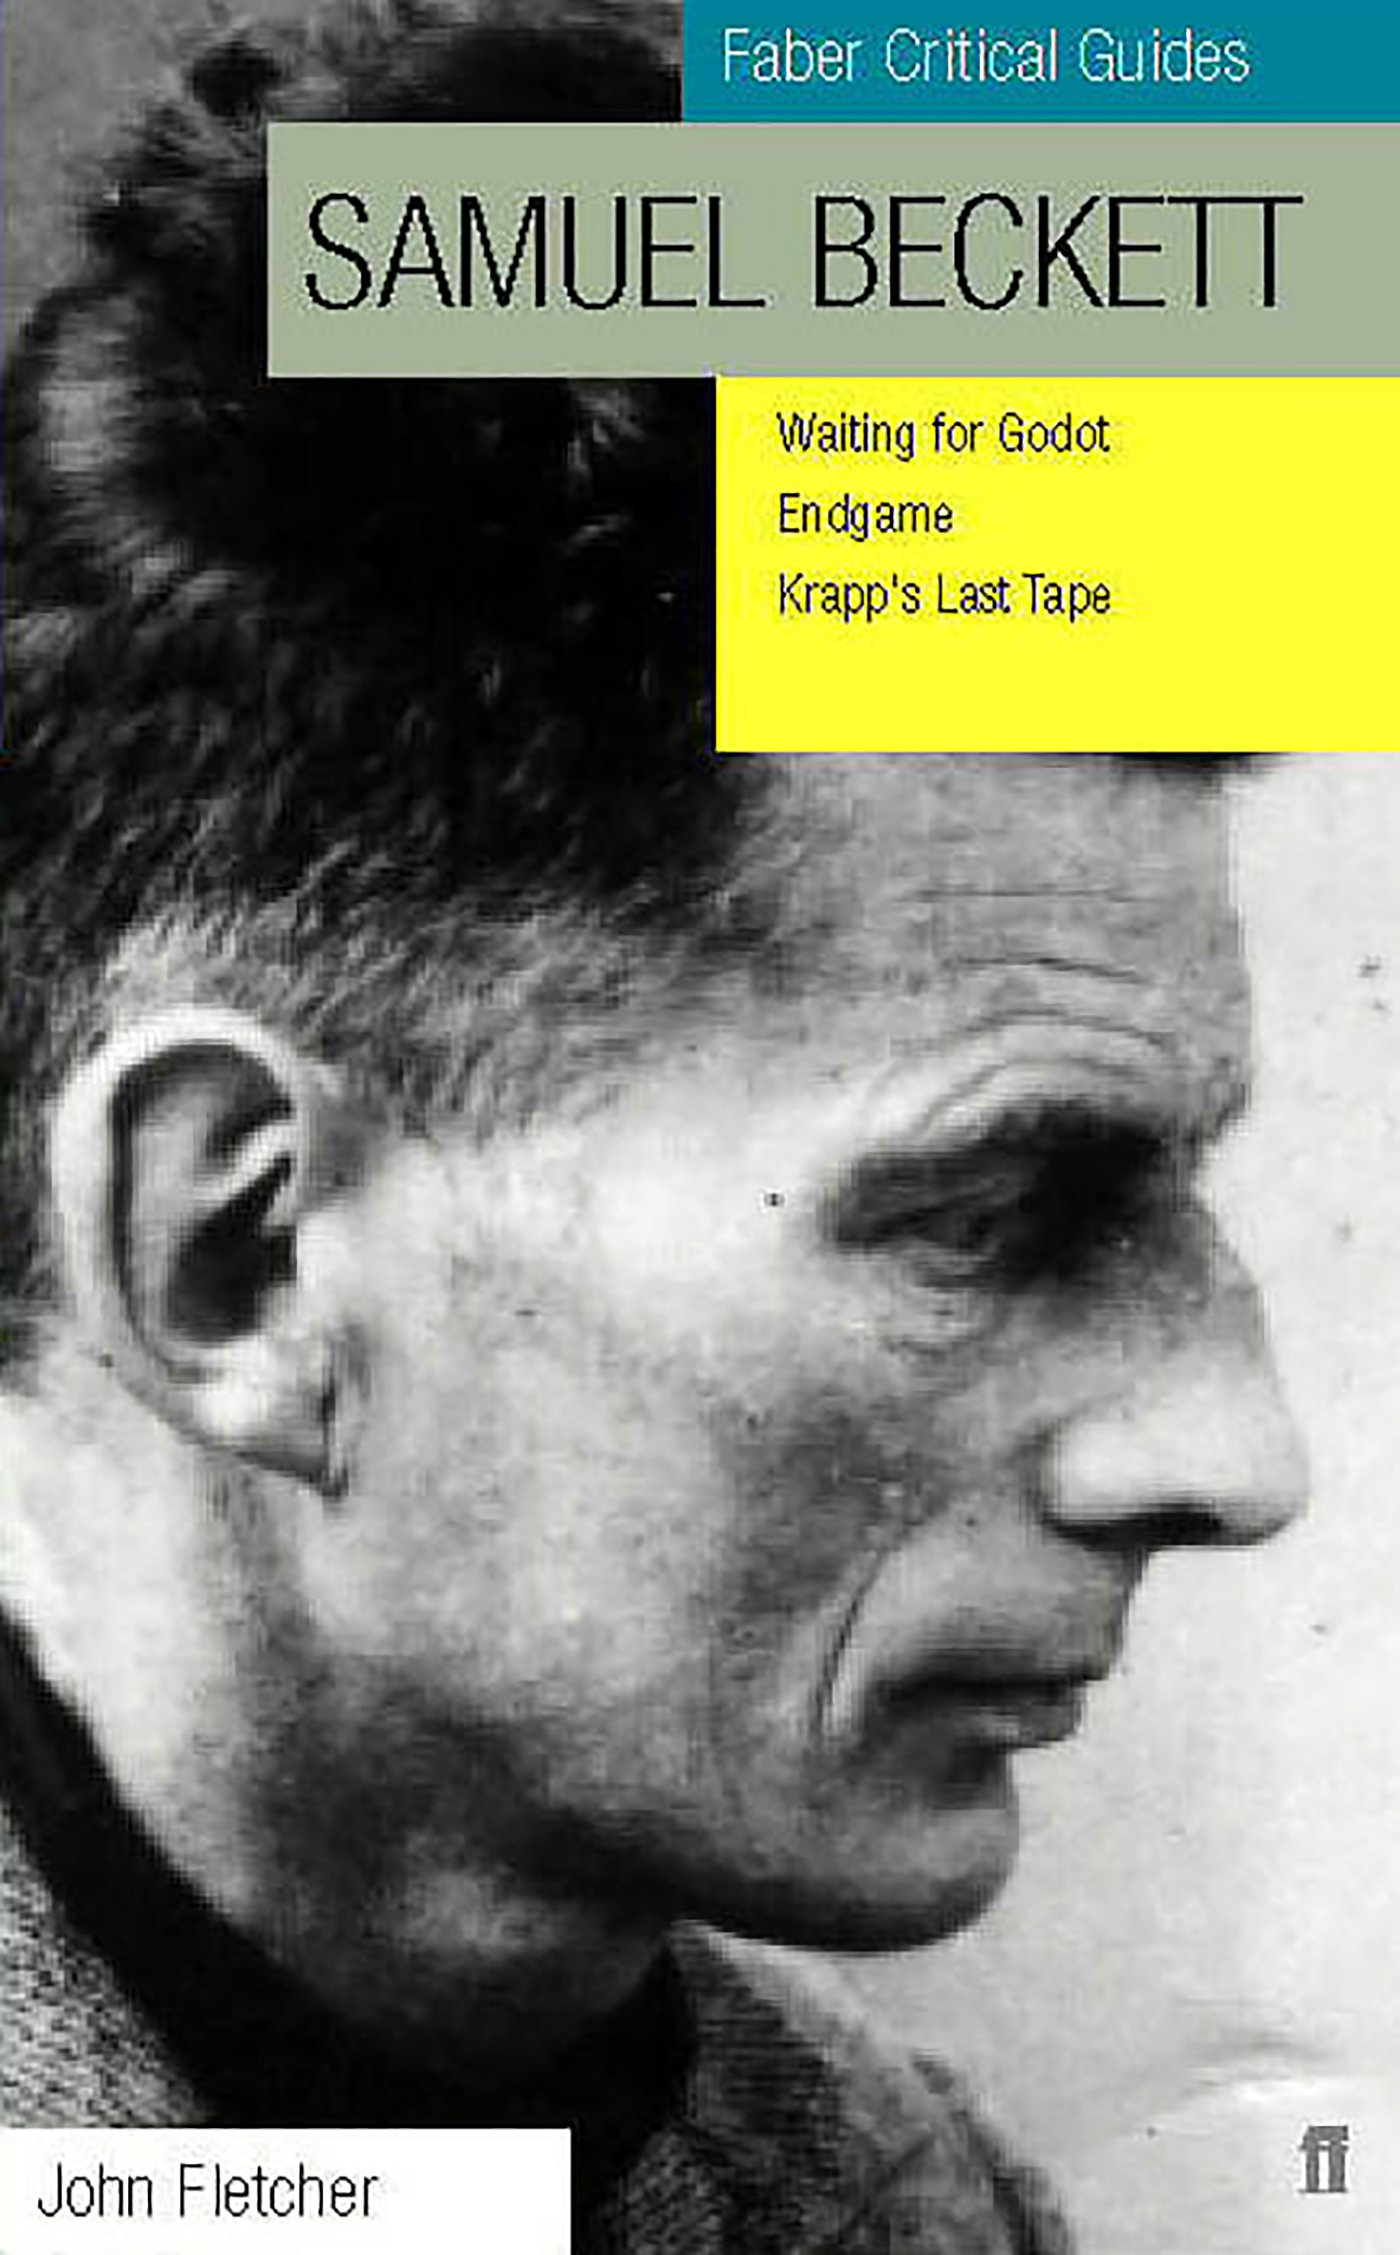 Samuel Beckett: Faber Critical Guide (Faber Critical Guides) pdf epub